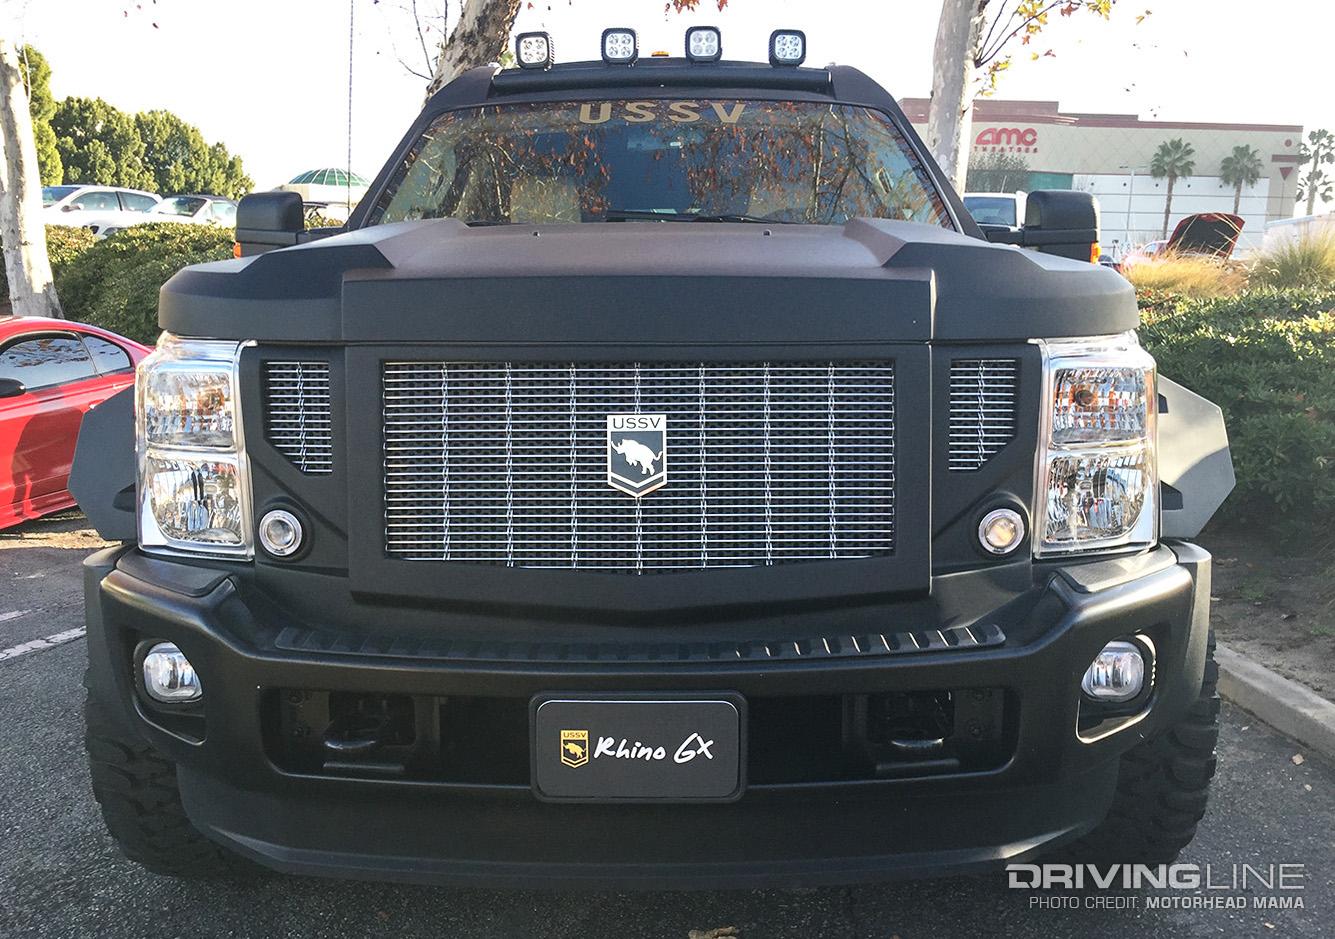 USSV's Rhino GX: The $200,000 Hummer Eater | DrivingLine